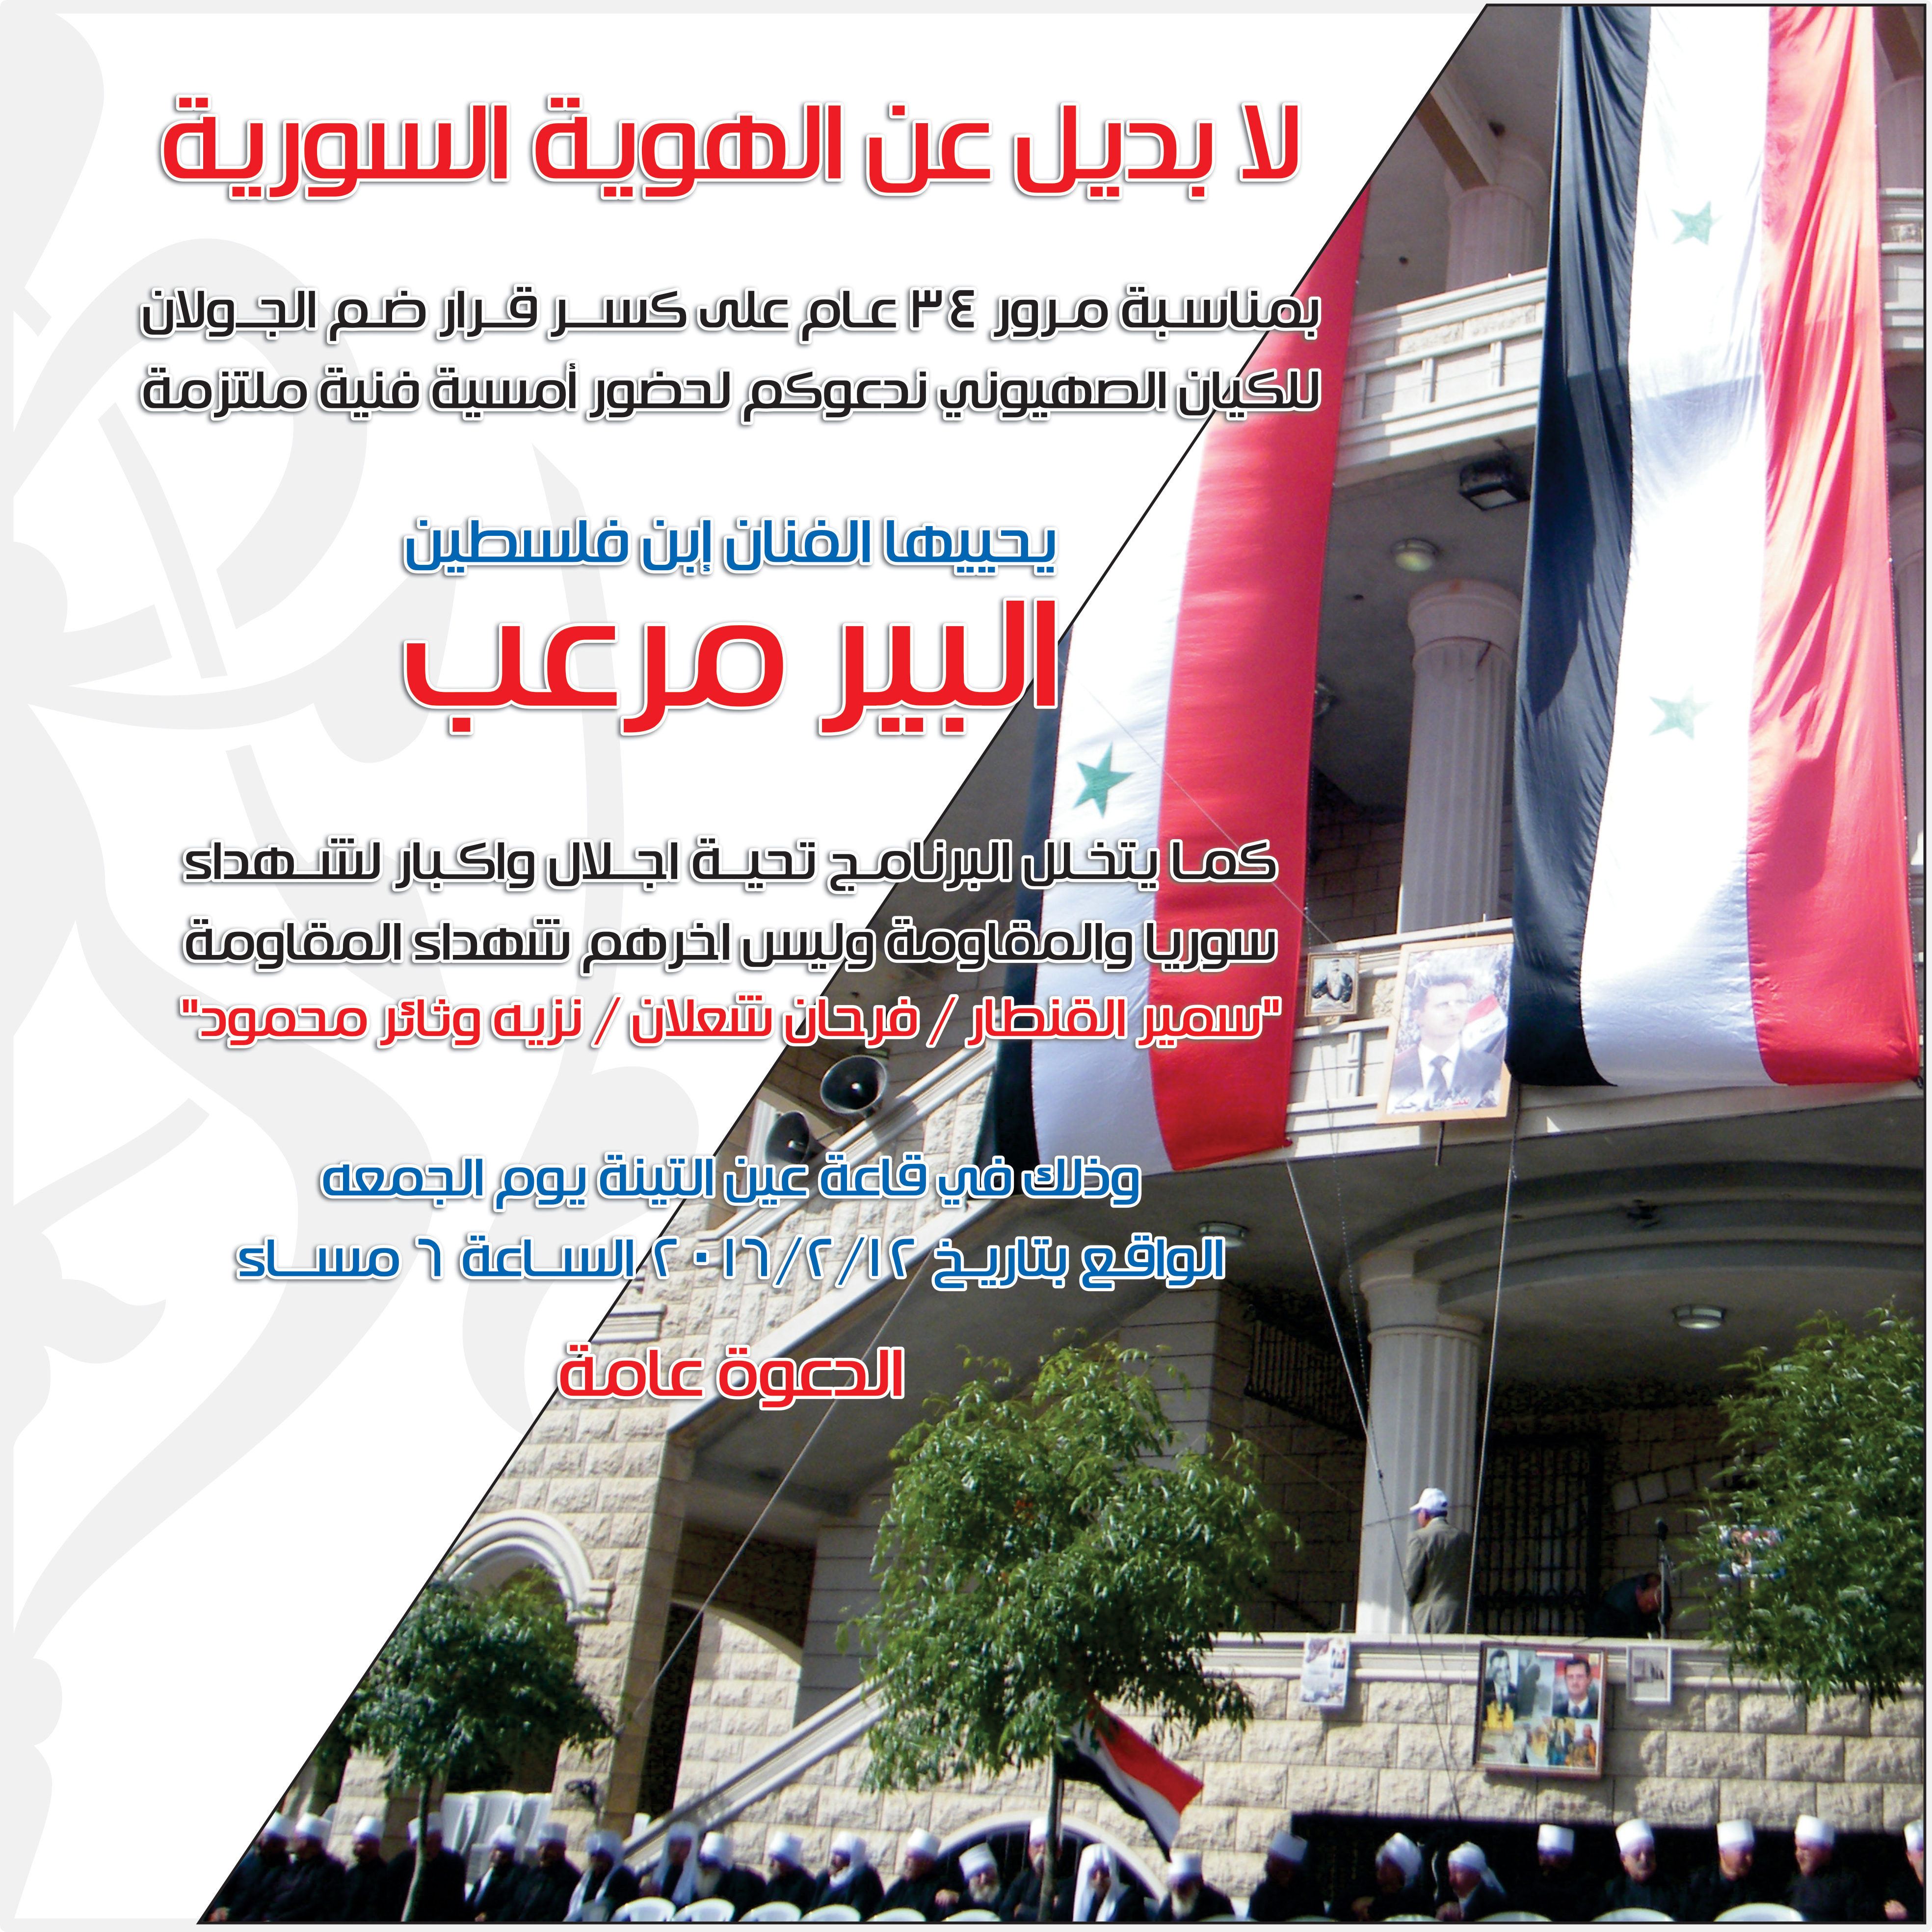 Photo of دعوة عامة بمناسبة الذكرى 34 للاضراب العام في الجولان